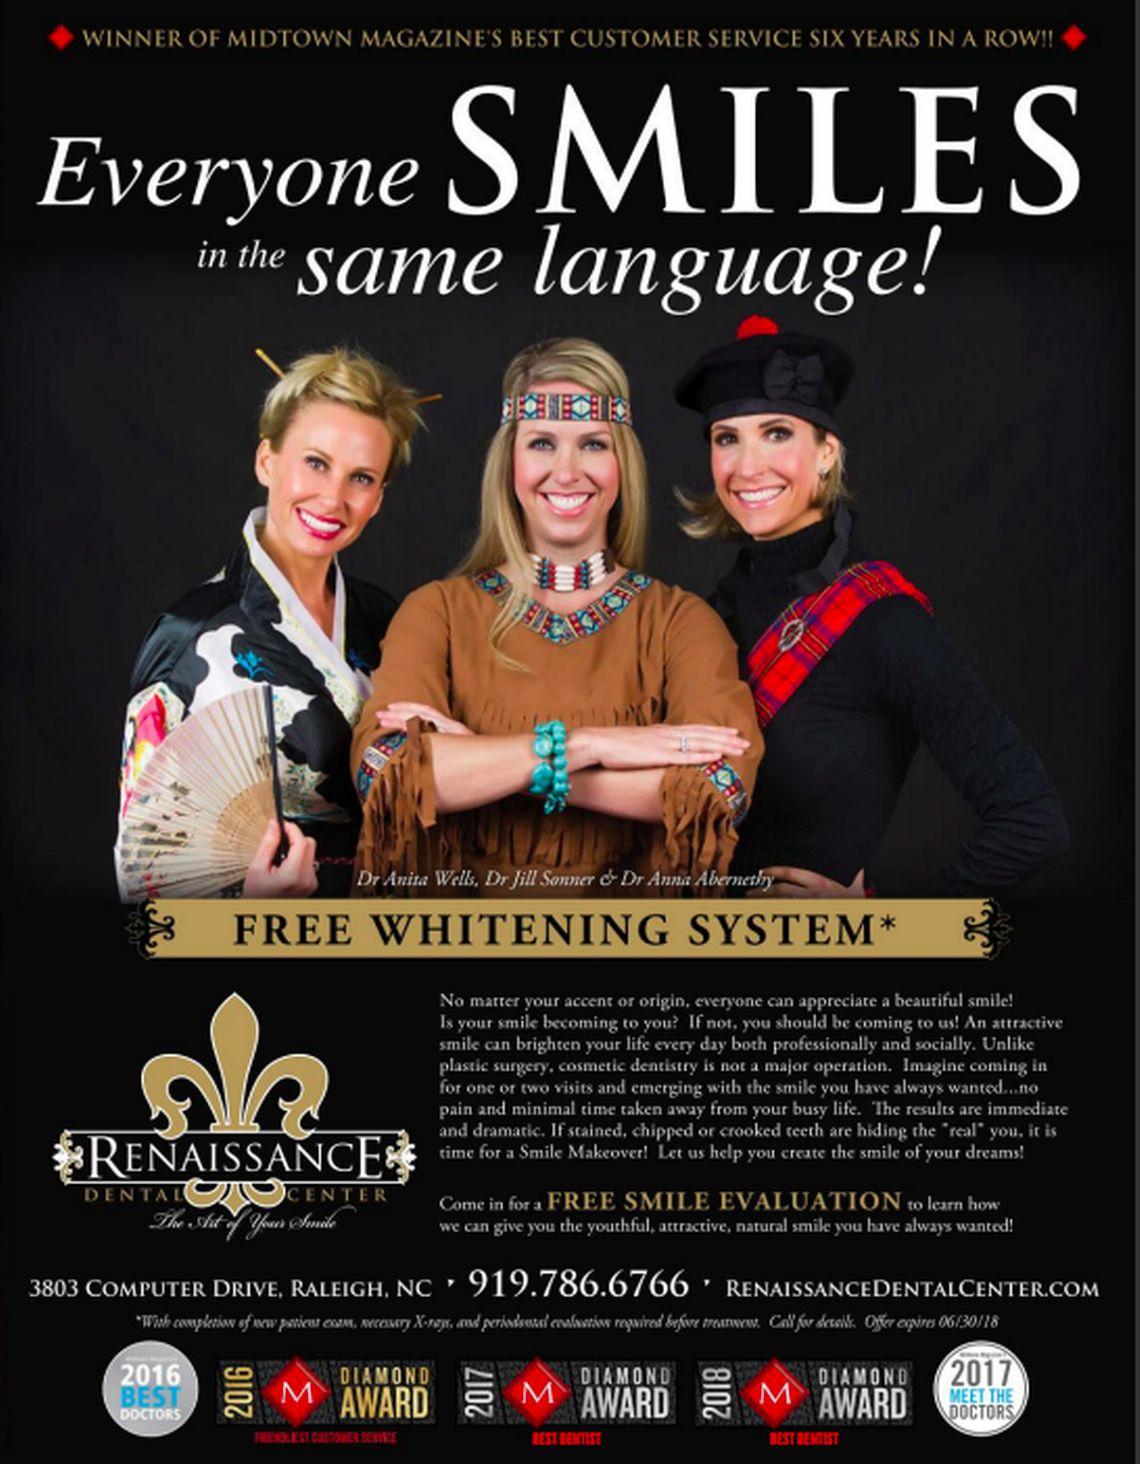 Renaissance Dental Centers unfortunate advertisement